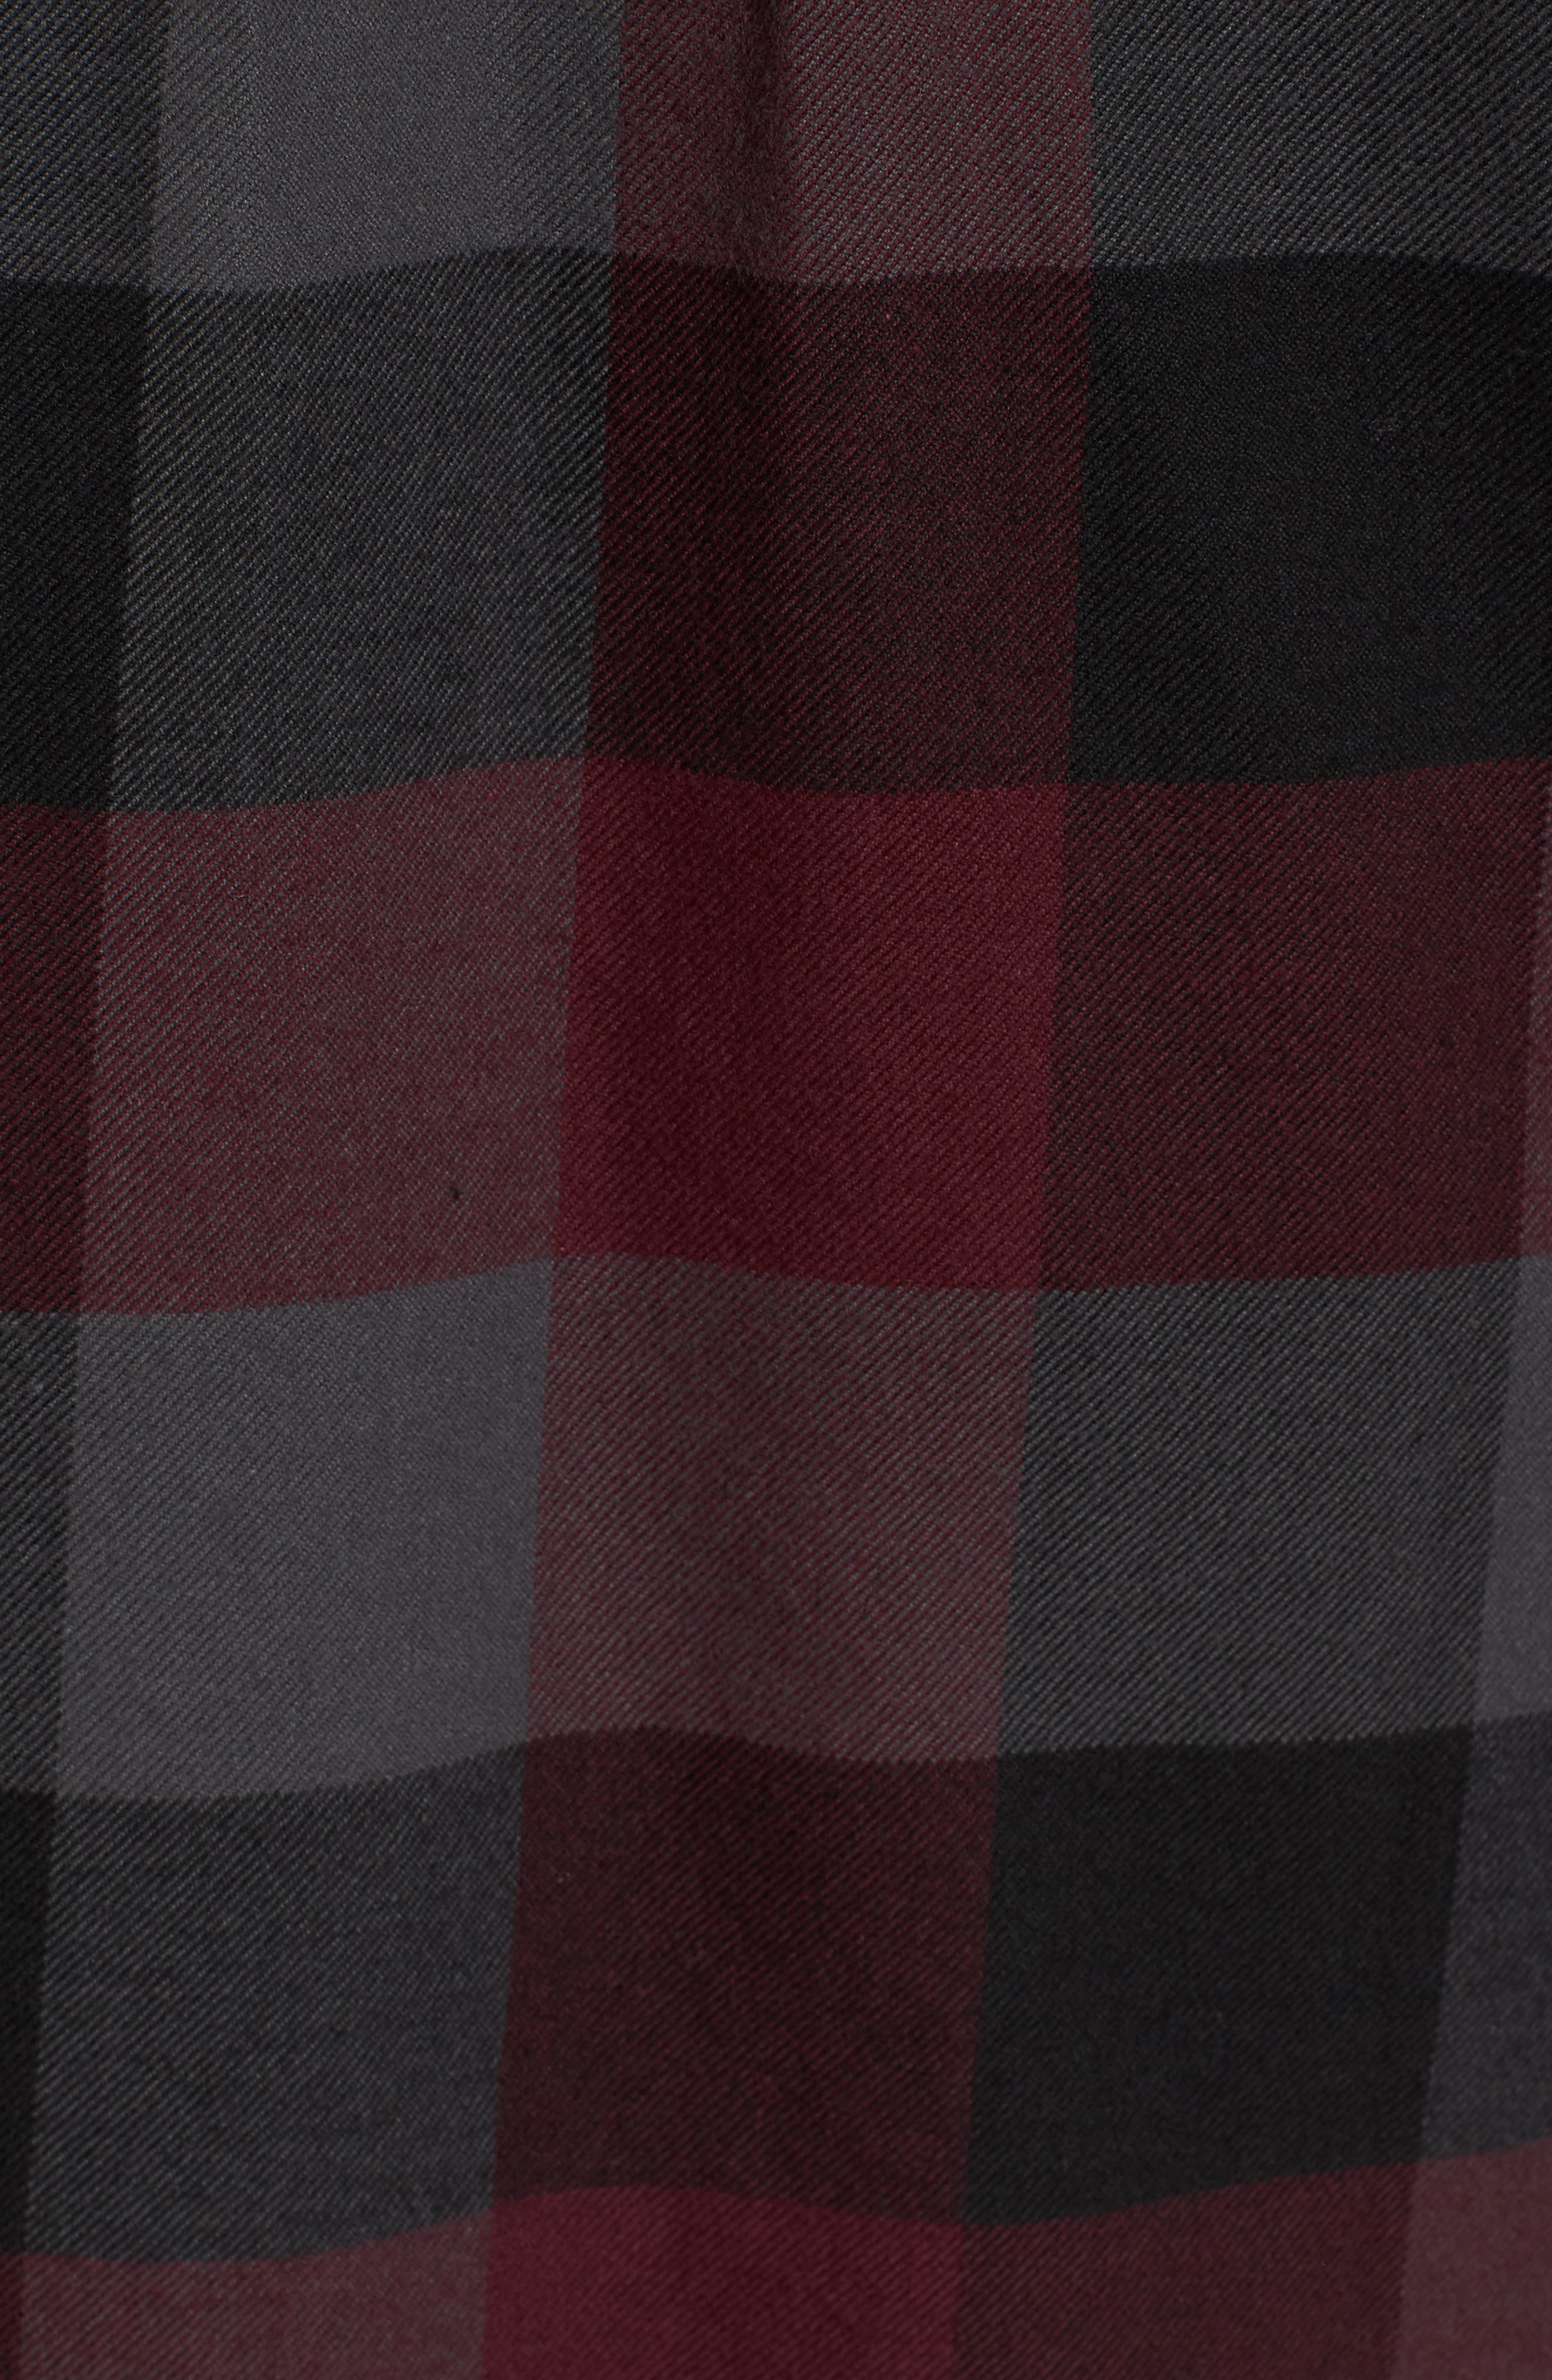 Trim Fit Check Flannel Woven Shirt,                             Alternate thumbnail 23, color,